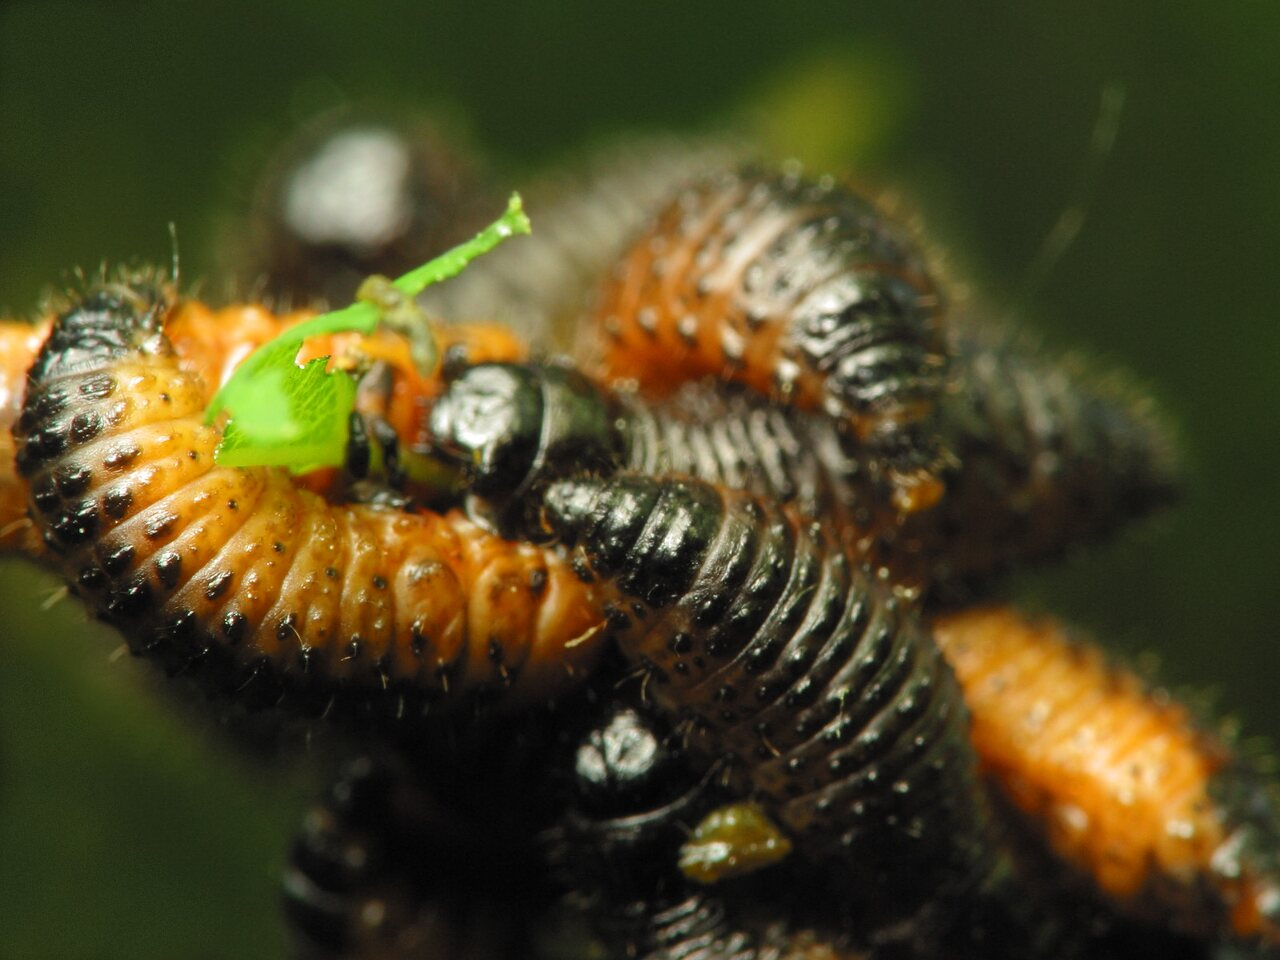 Chrysomelidae-larvae-1252.jpg